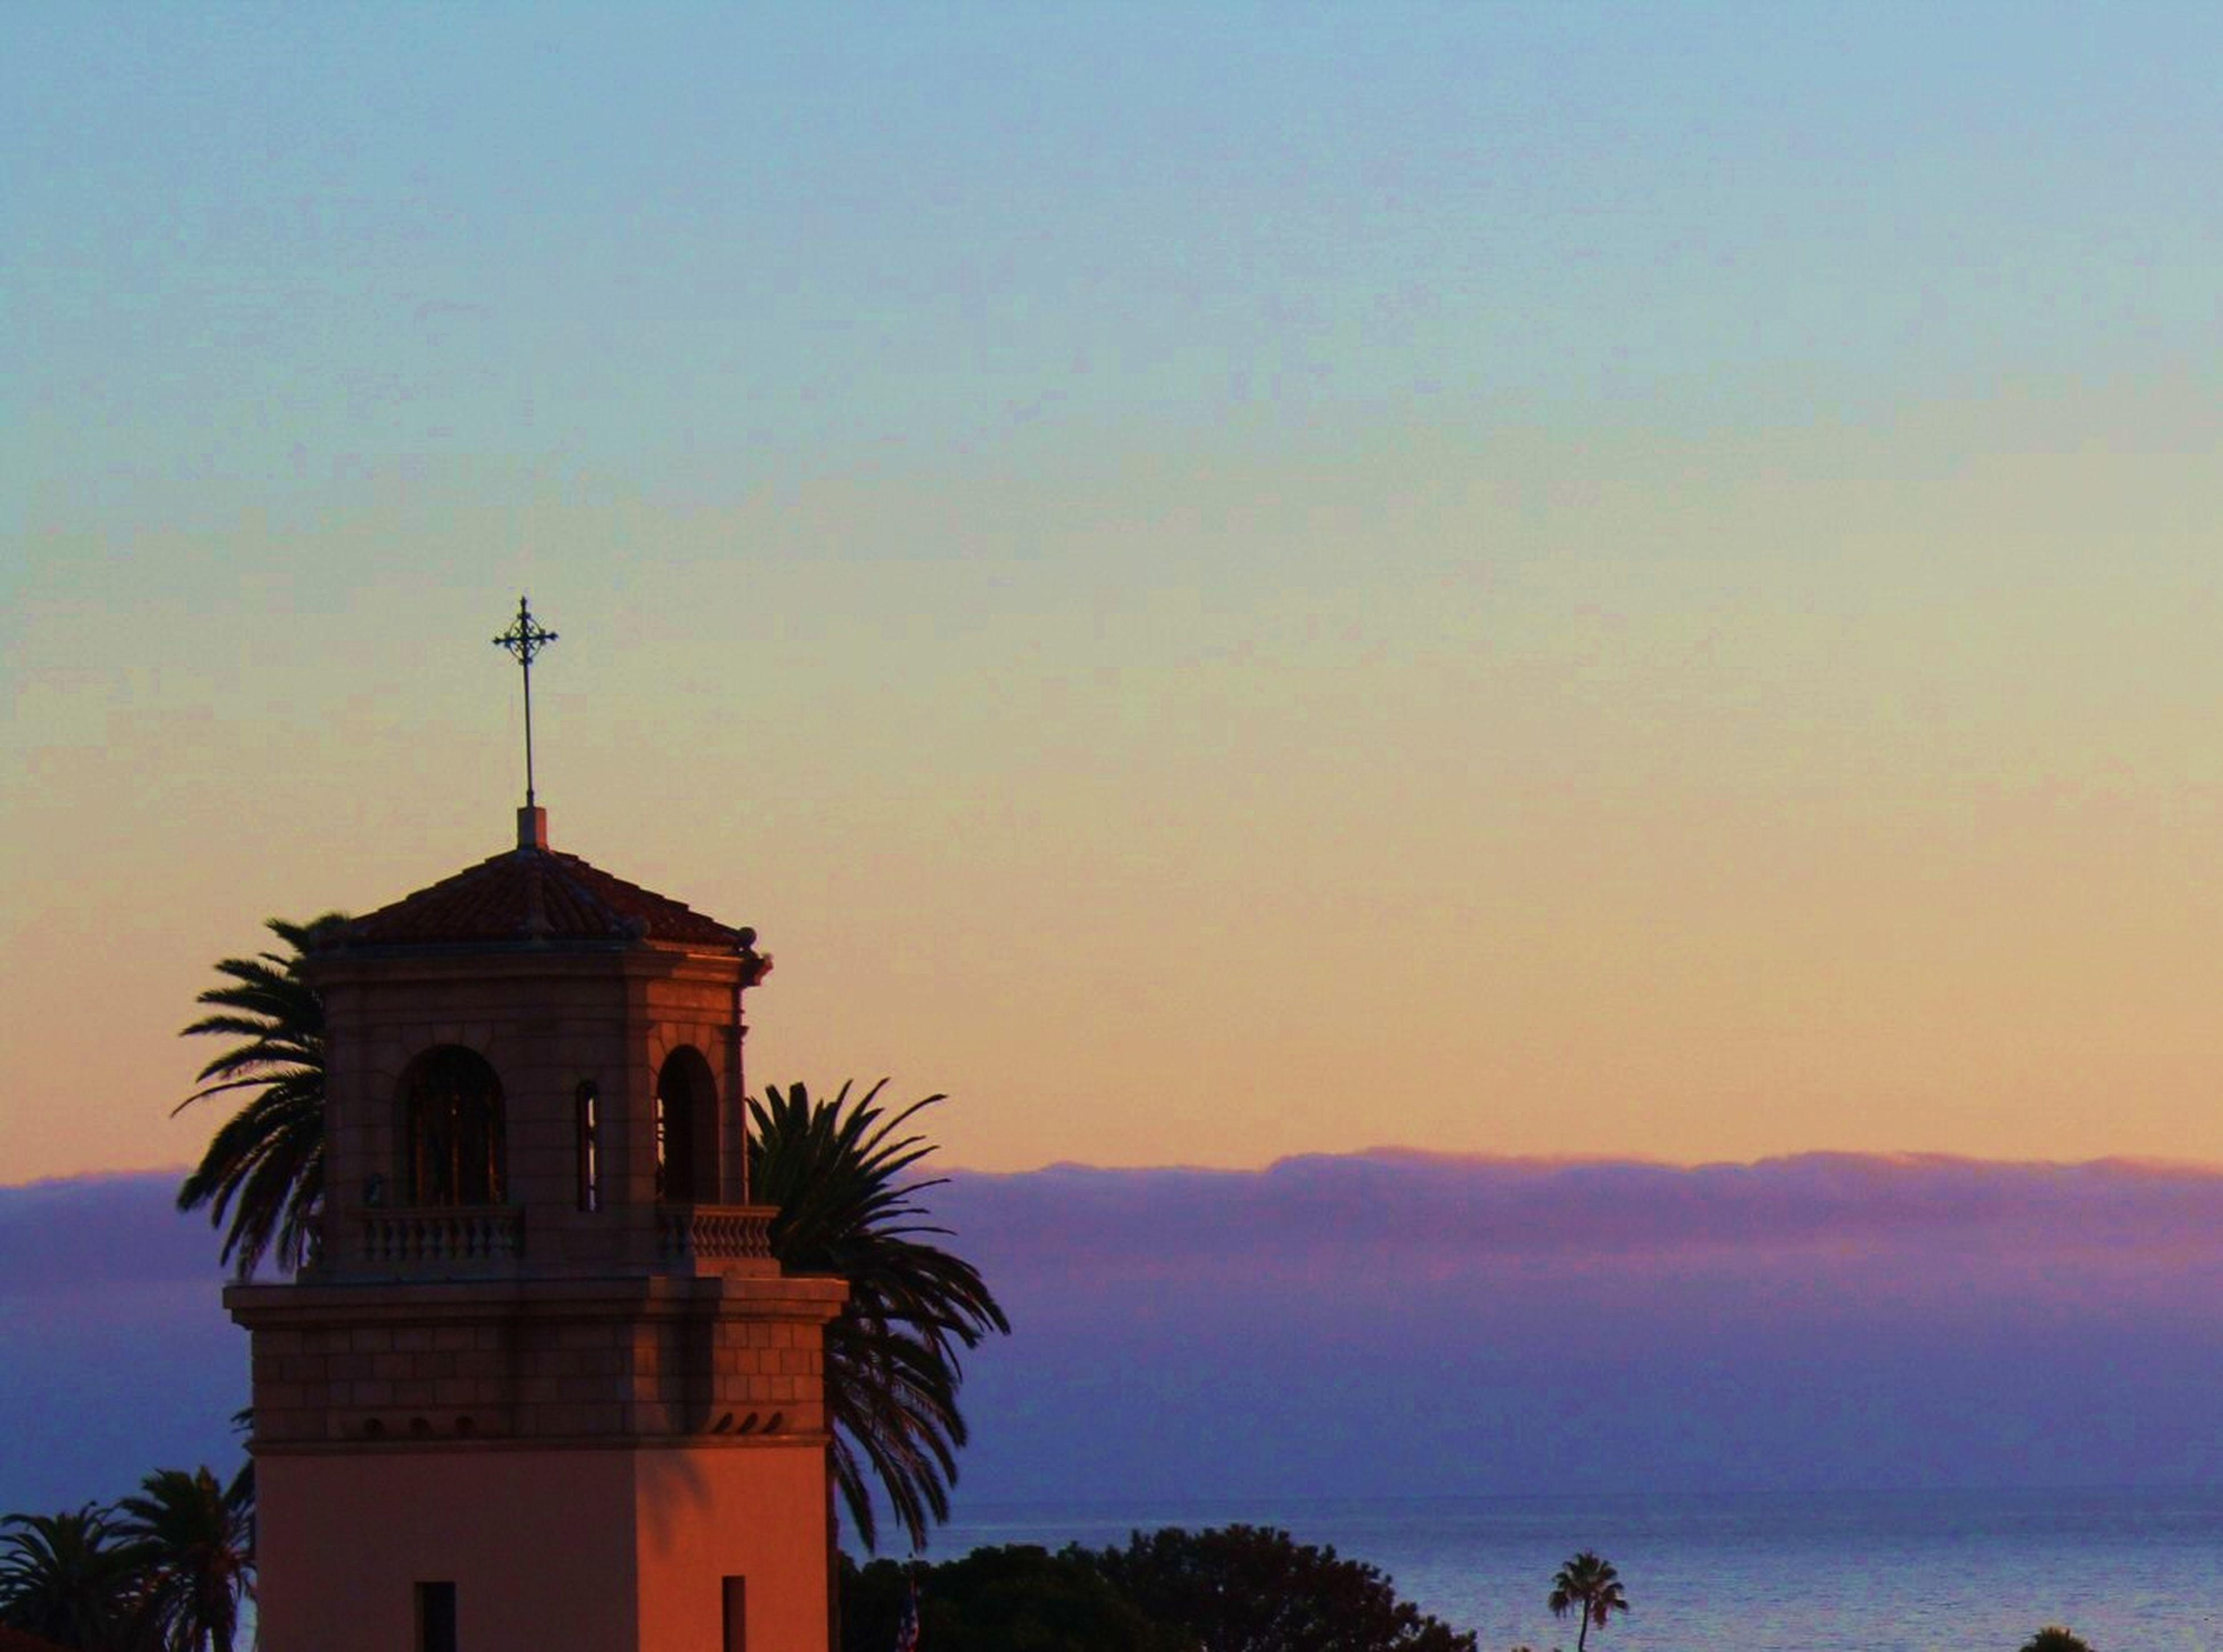 Chasing Steeples La Jolla Sunset